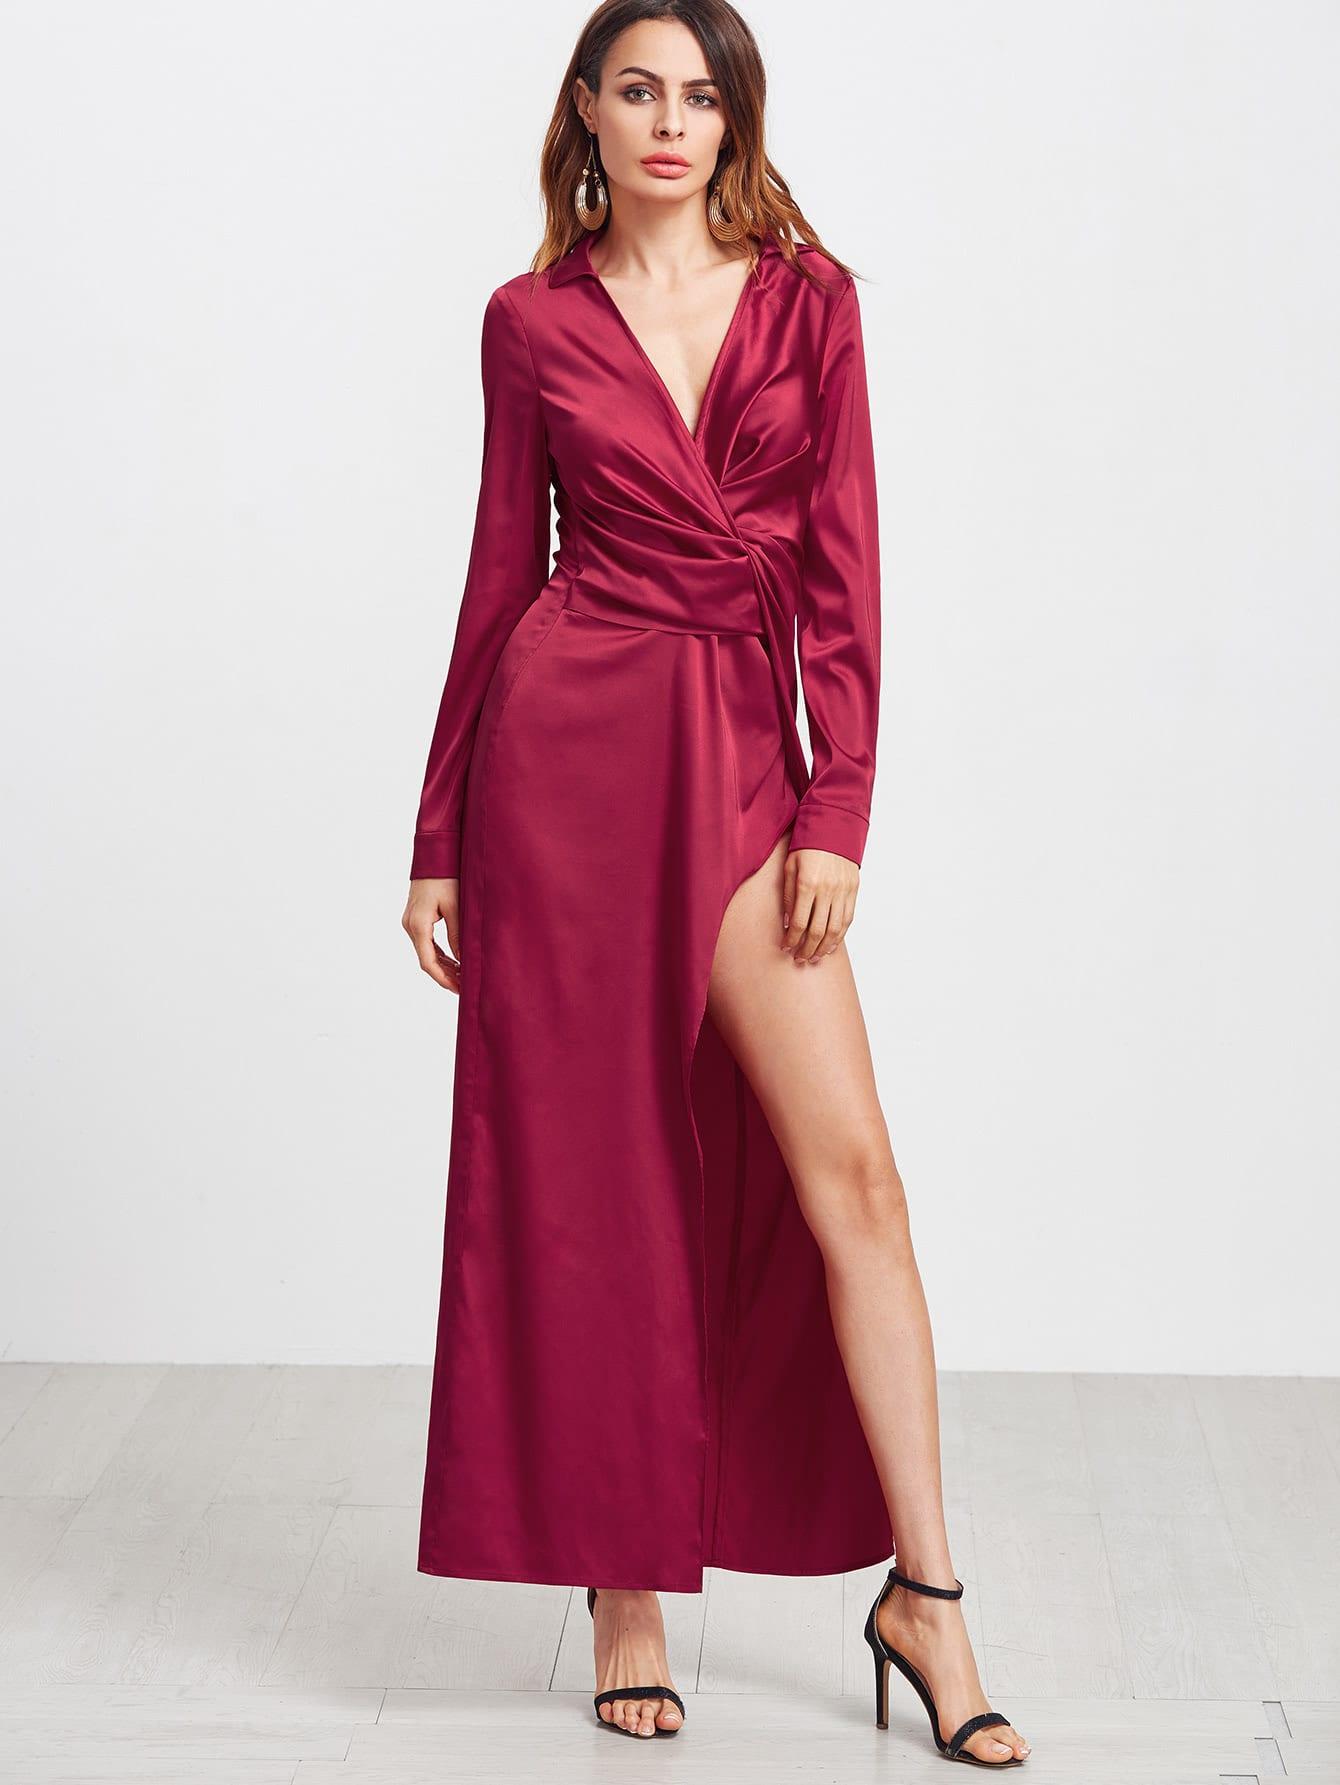 Red Deep V Neck Twist Front Long Sleeve Dress dress161230703